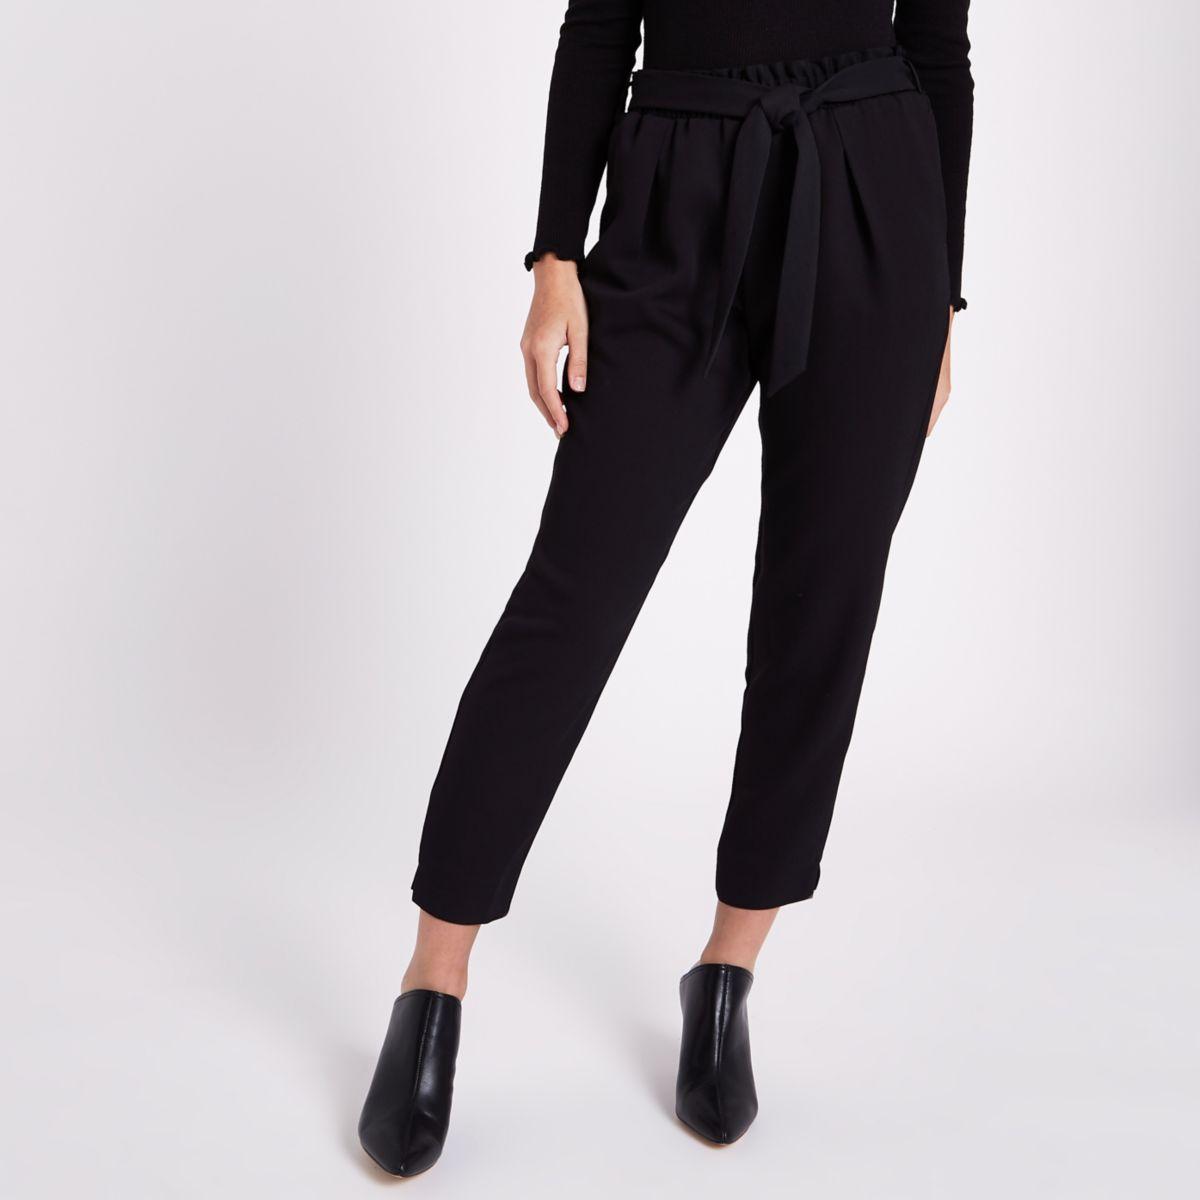 RI Petite - Zwarte smaltoelopende broek met strikceintuur